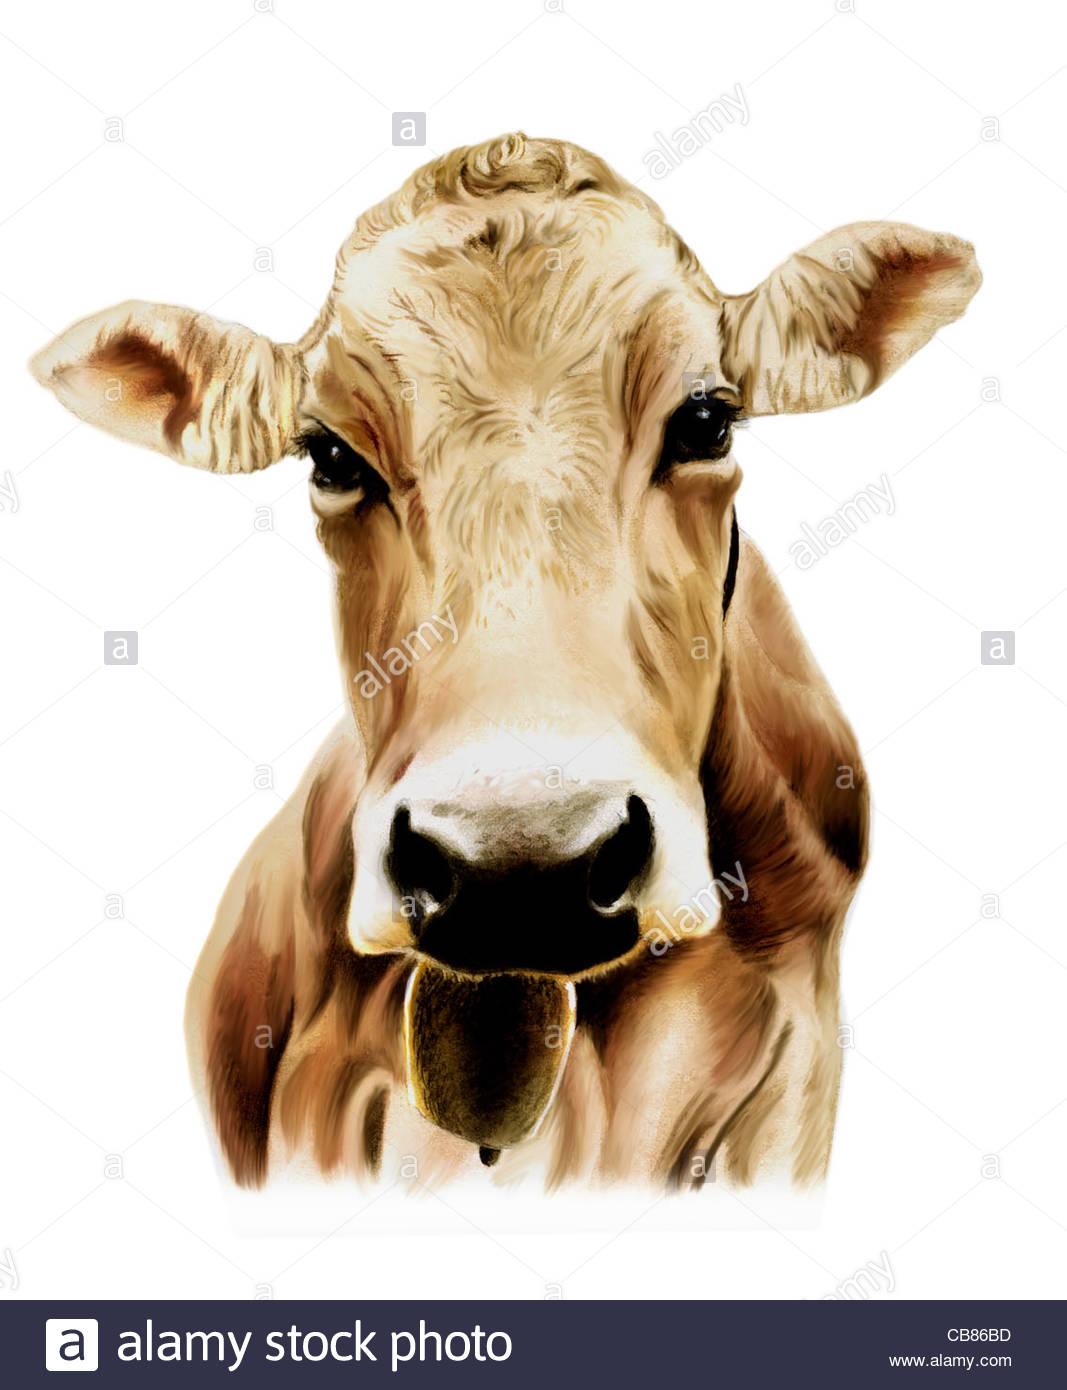 Cow Drawing Stockfotos & Cow Drawing Bilder - Alamy